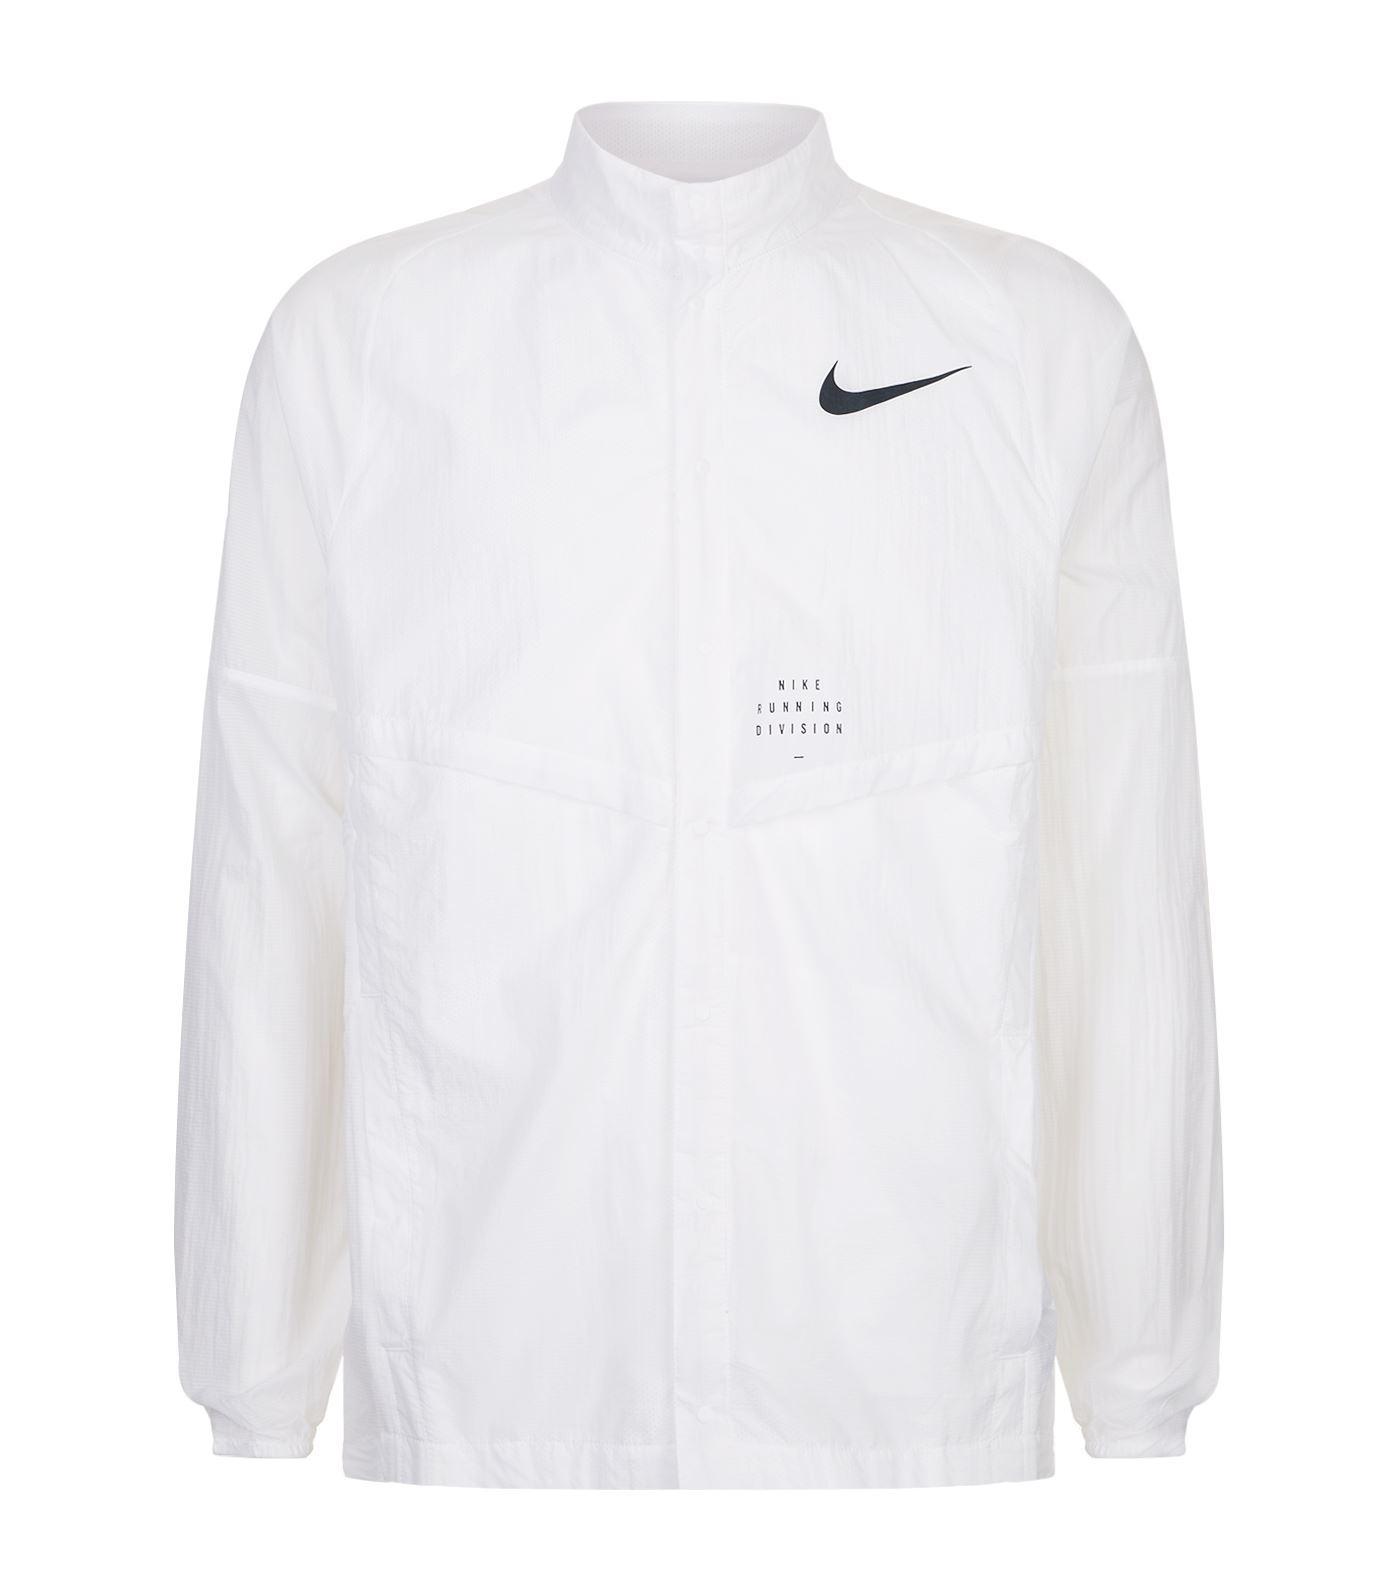 Pagar tributo docena Interpretar  nike running division jacket factory outlet 71017 dba46